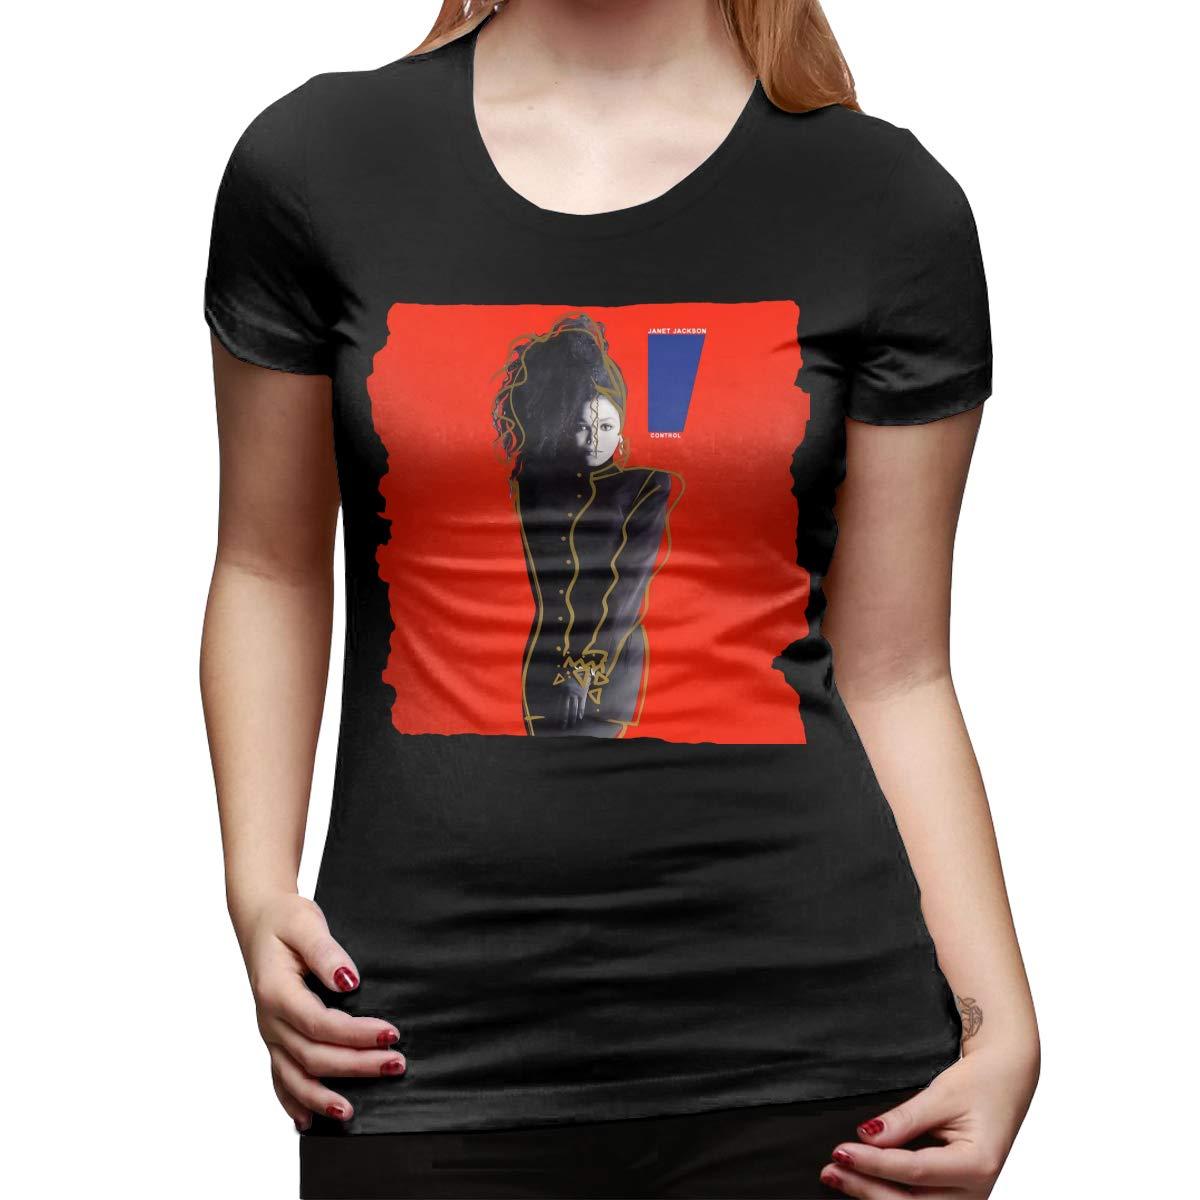 Janet Jackson Band Woman Loose Comfortable Shirts